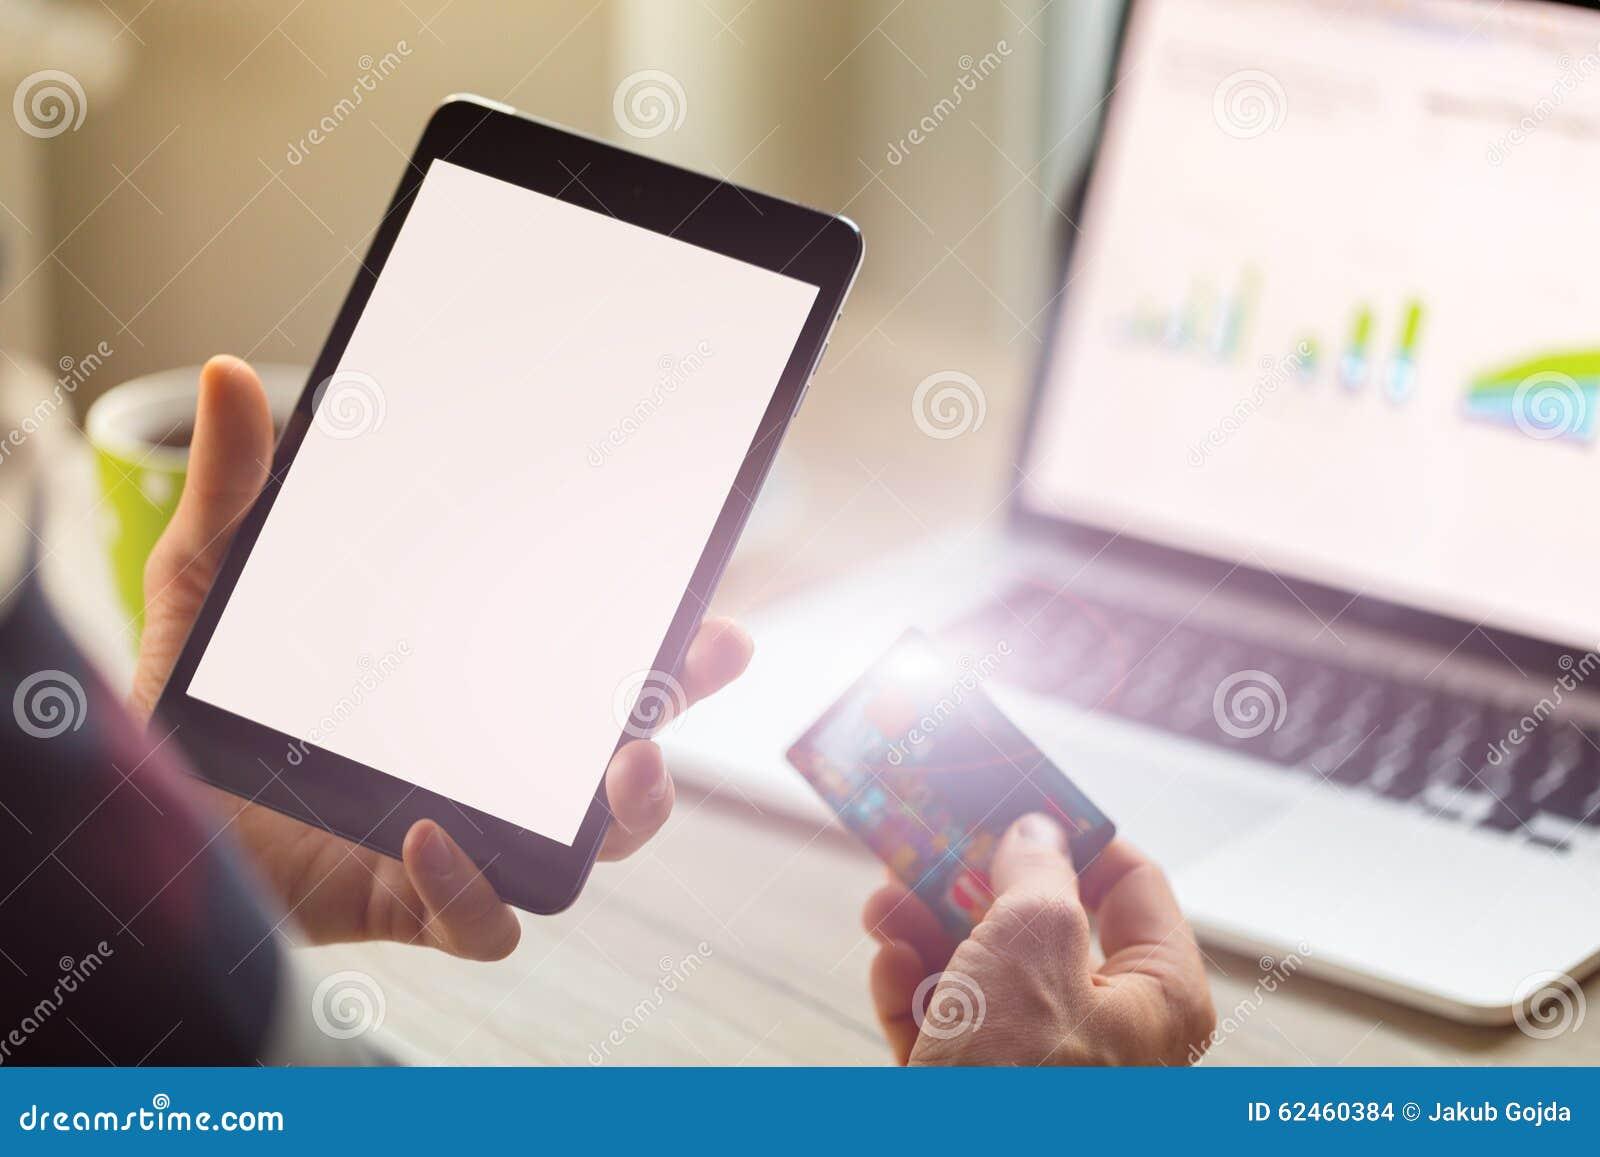 Close-up of man holding digital tablet